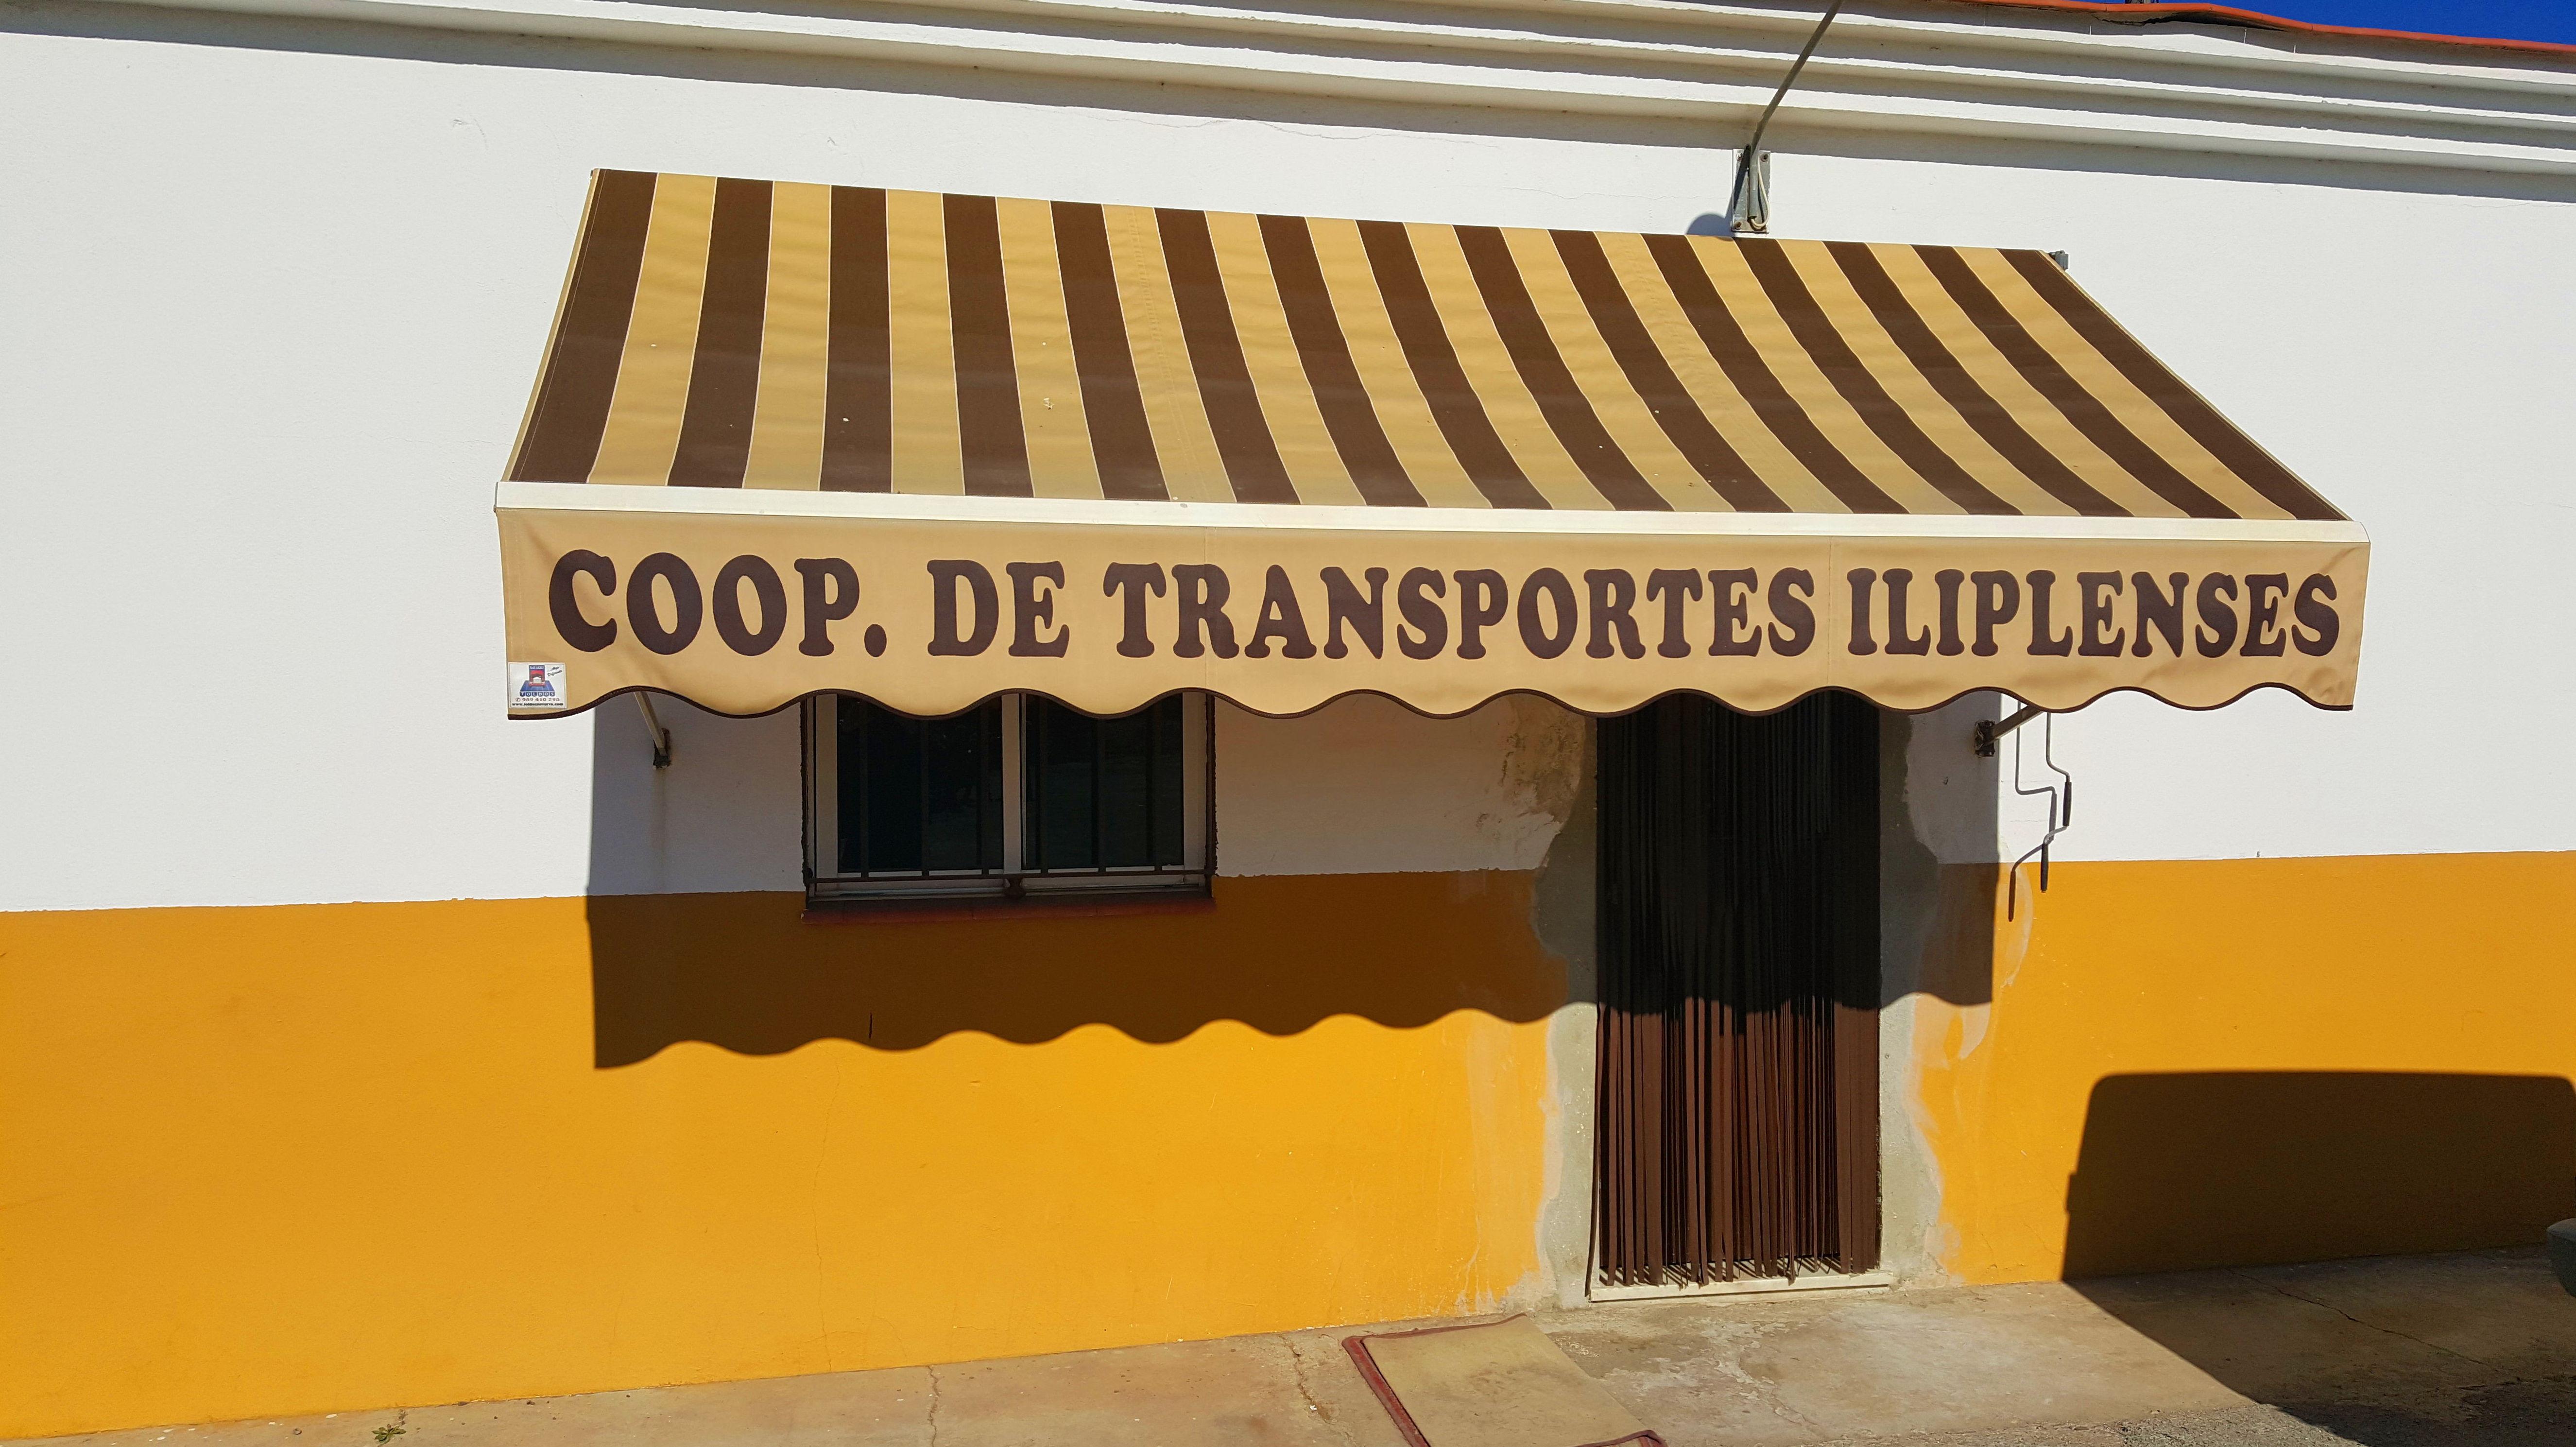 Foto 4 de Transporte de áridos en Niebla | Cooperativa de Transportes Iliplense